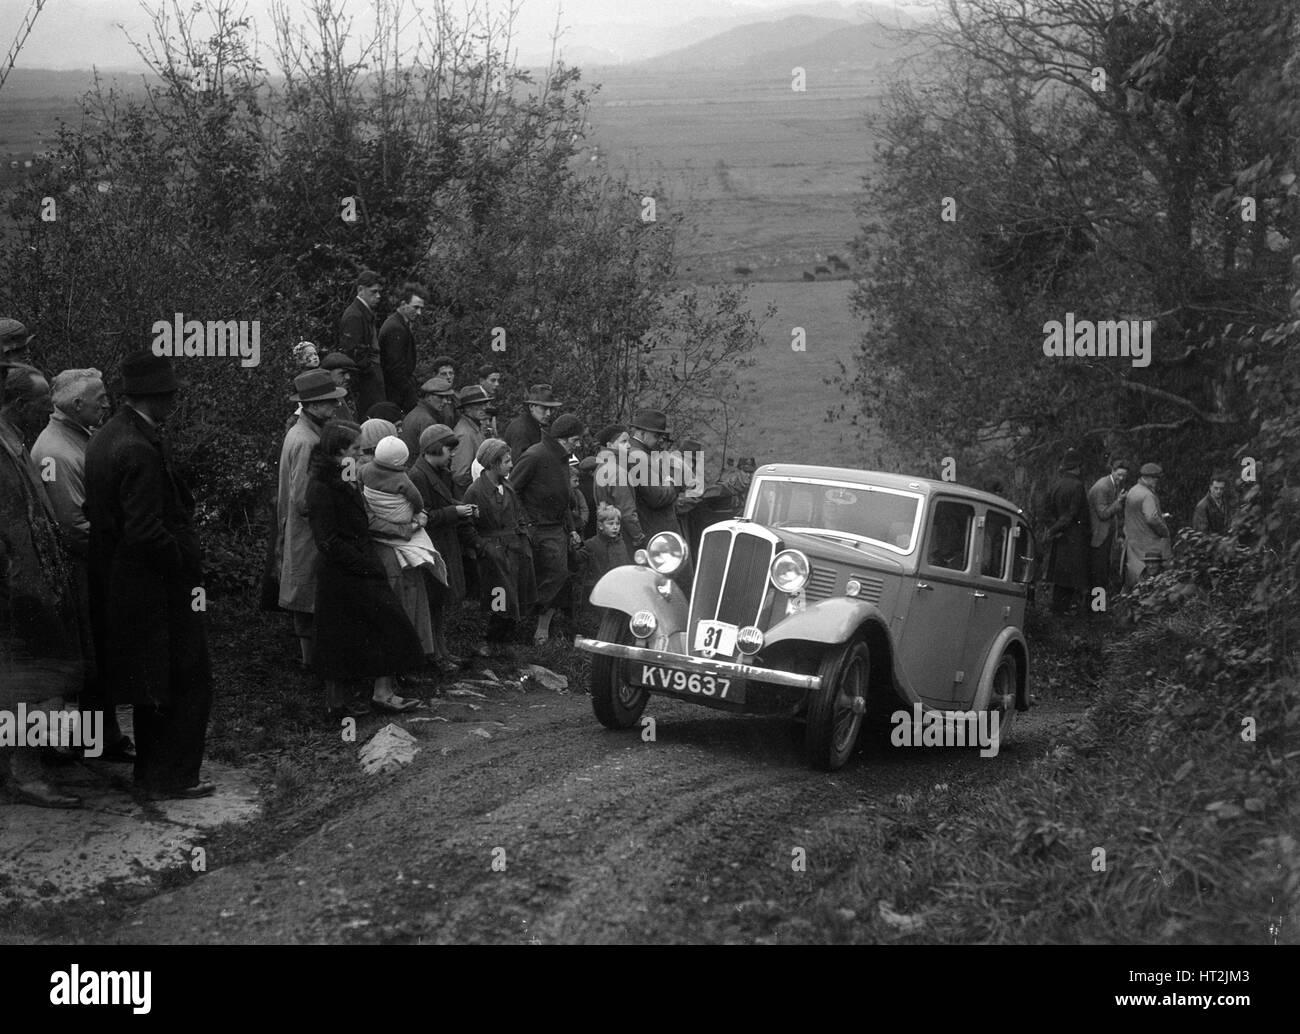 1934 Standard Ten taking part in a Standard Car Owners Club trial. Artist: Bill Brunell. - Stock Image